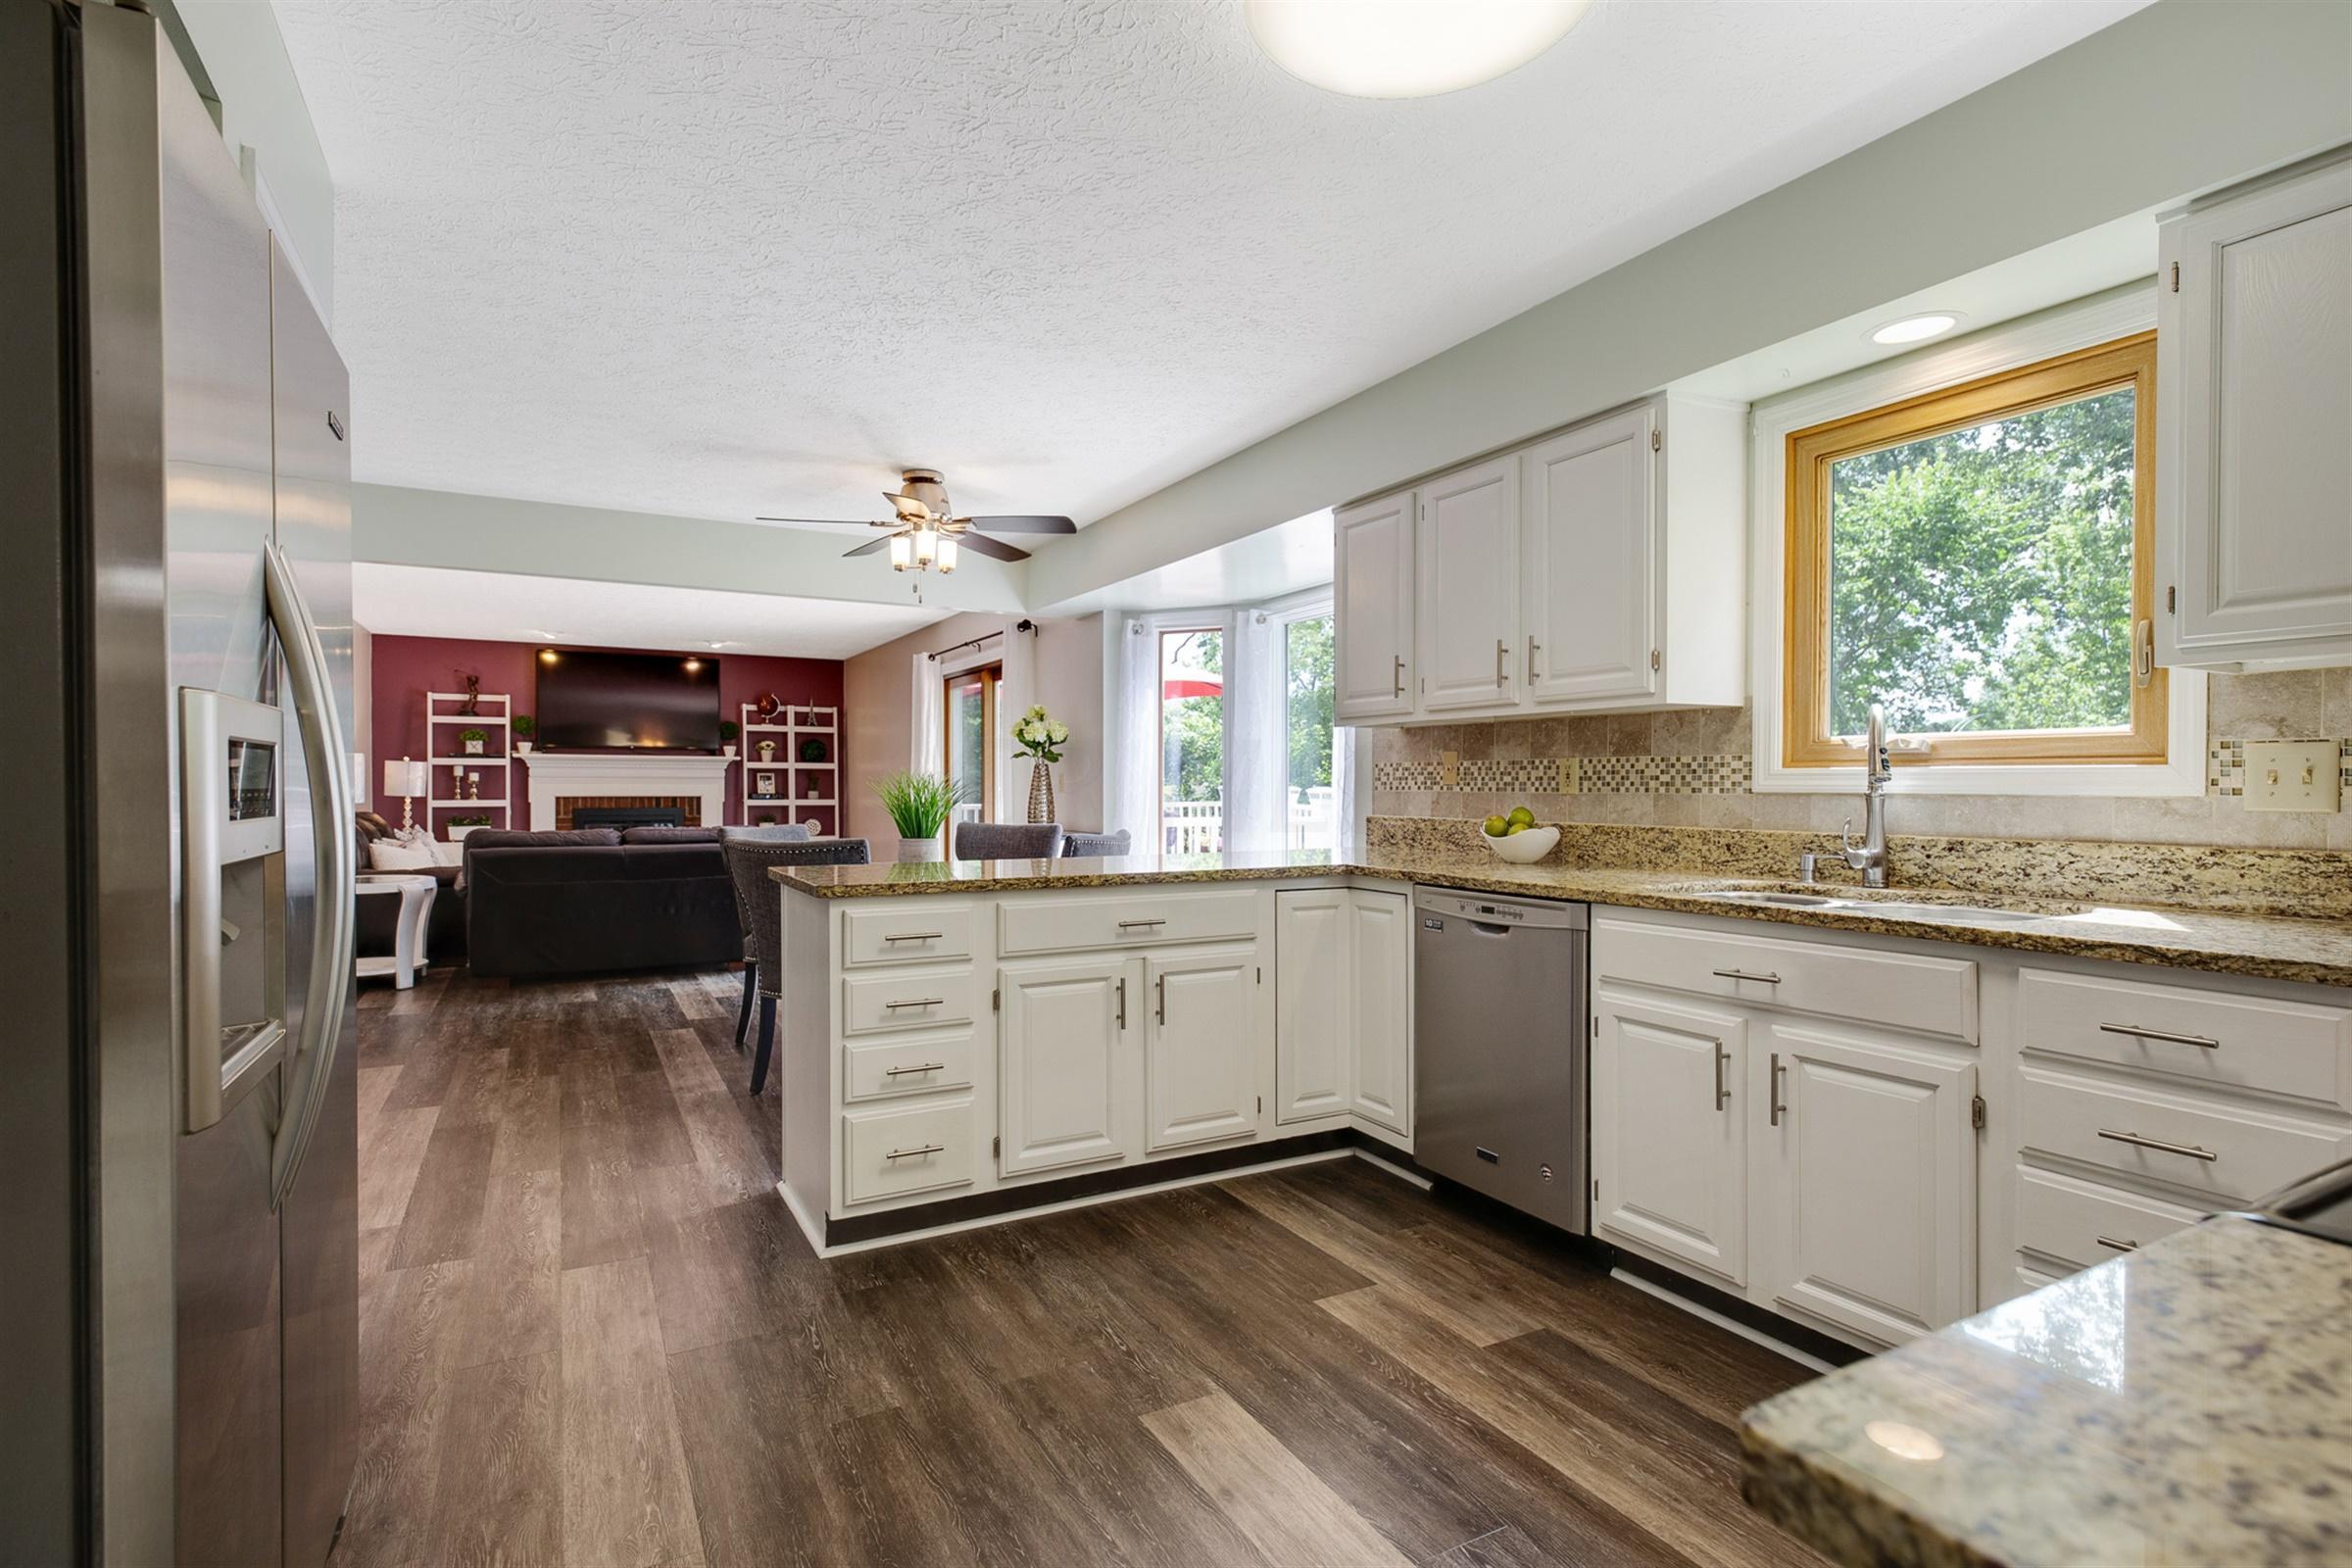 463 Sutterton Drive, Gahanna, Ohio 43230, 4 Bedrooms Bedrooms, ,3 BathroomsBathrooms,Residential,For Sale,Sutterton,220020989